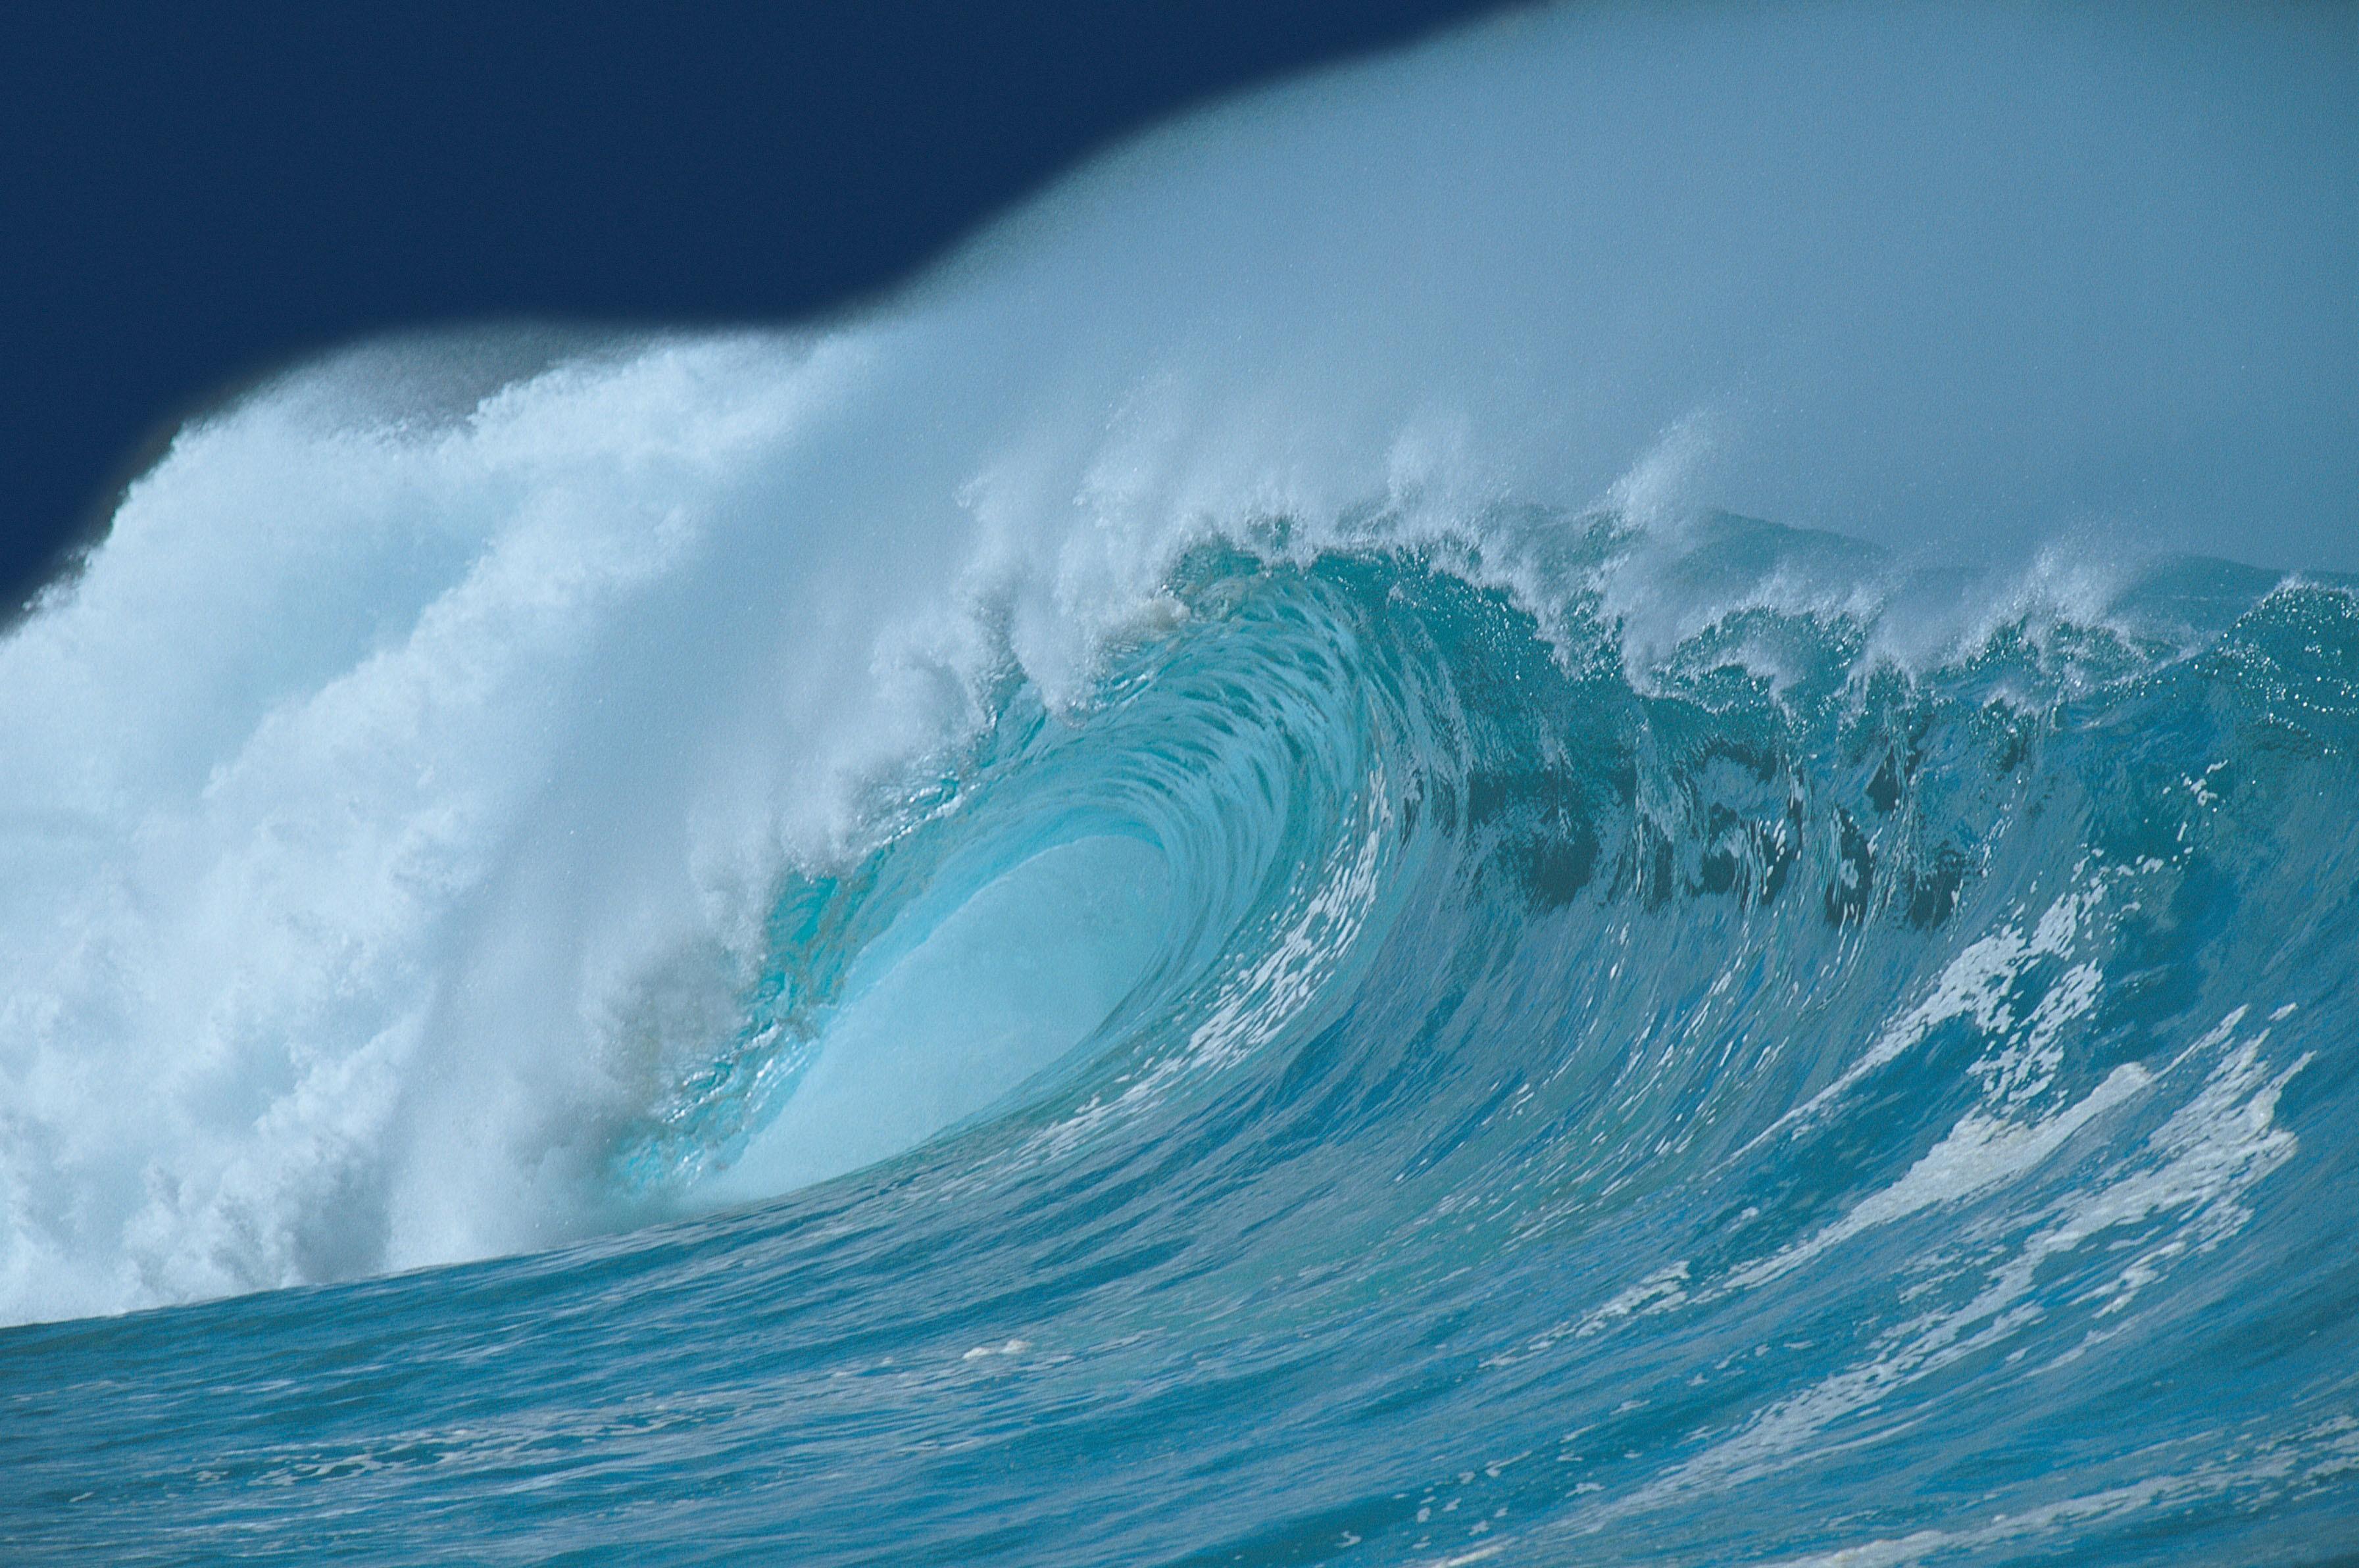 live ocean waves screensaver 3586x2384